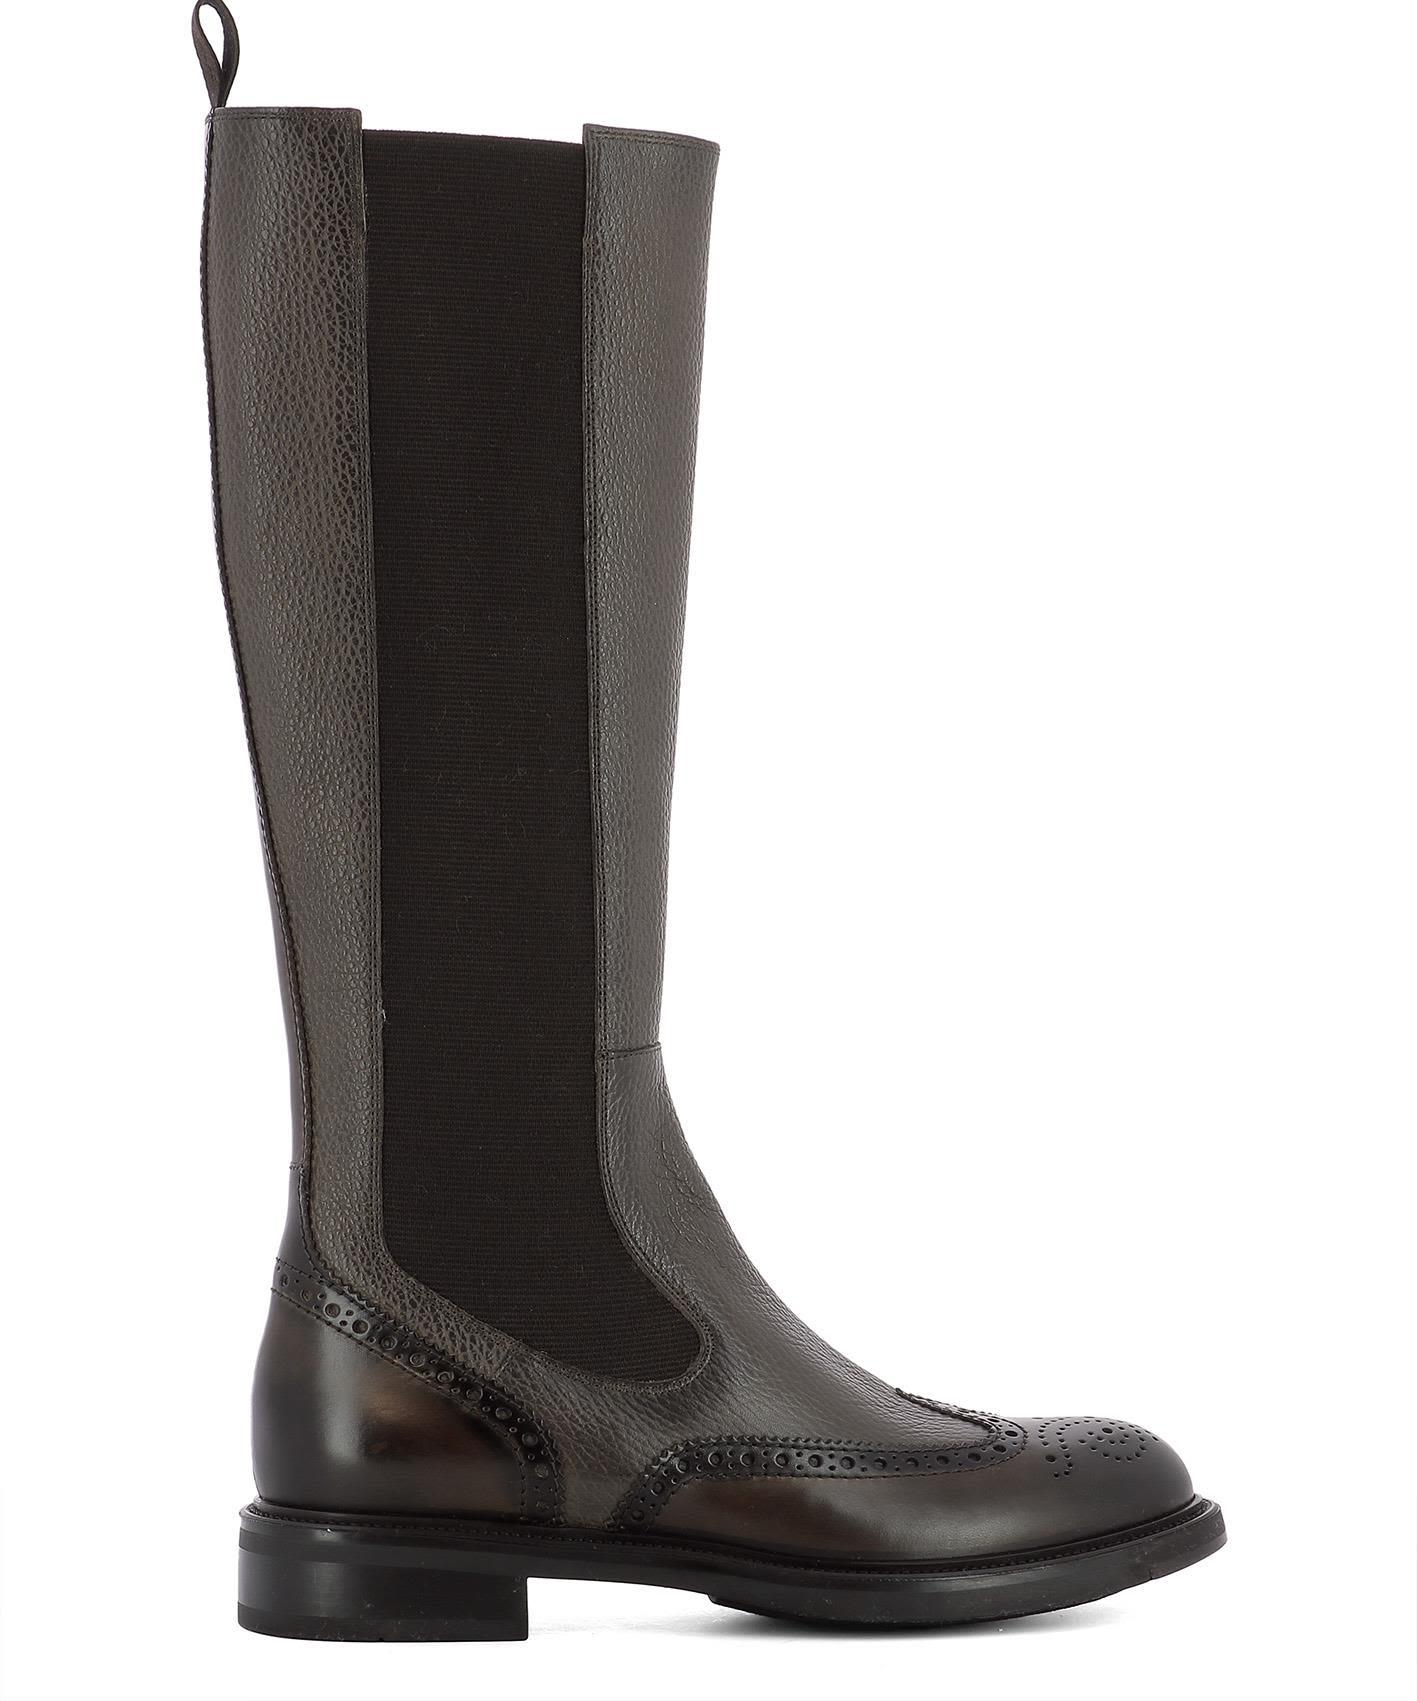 Santoni Brown Rubber Boots